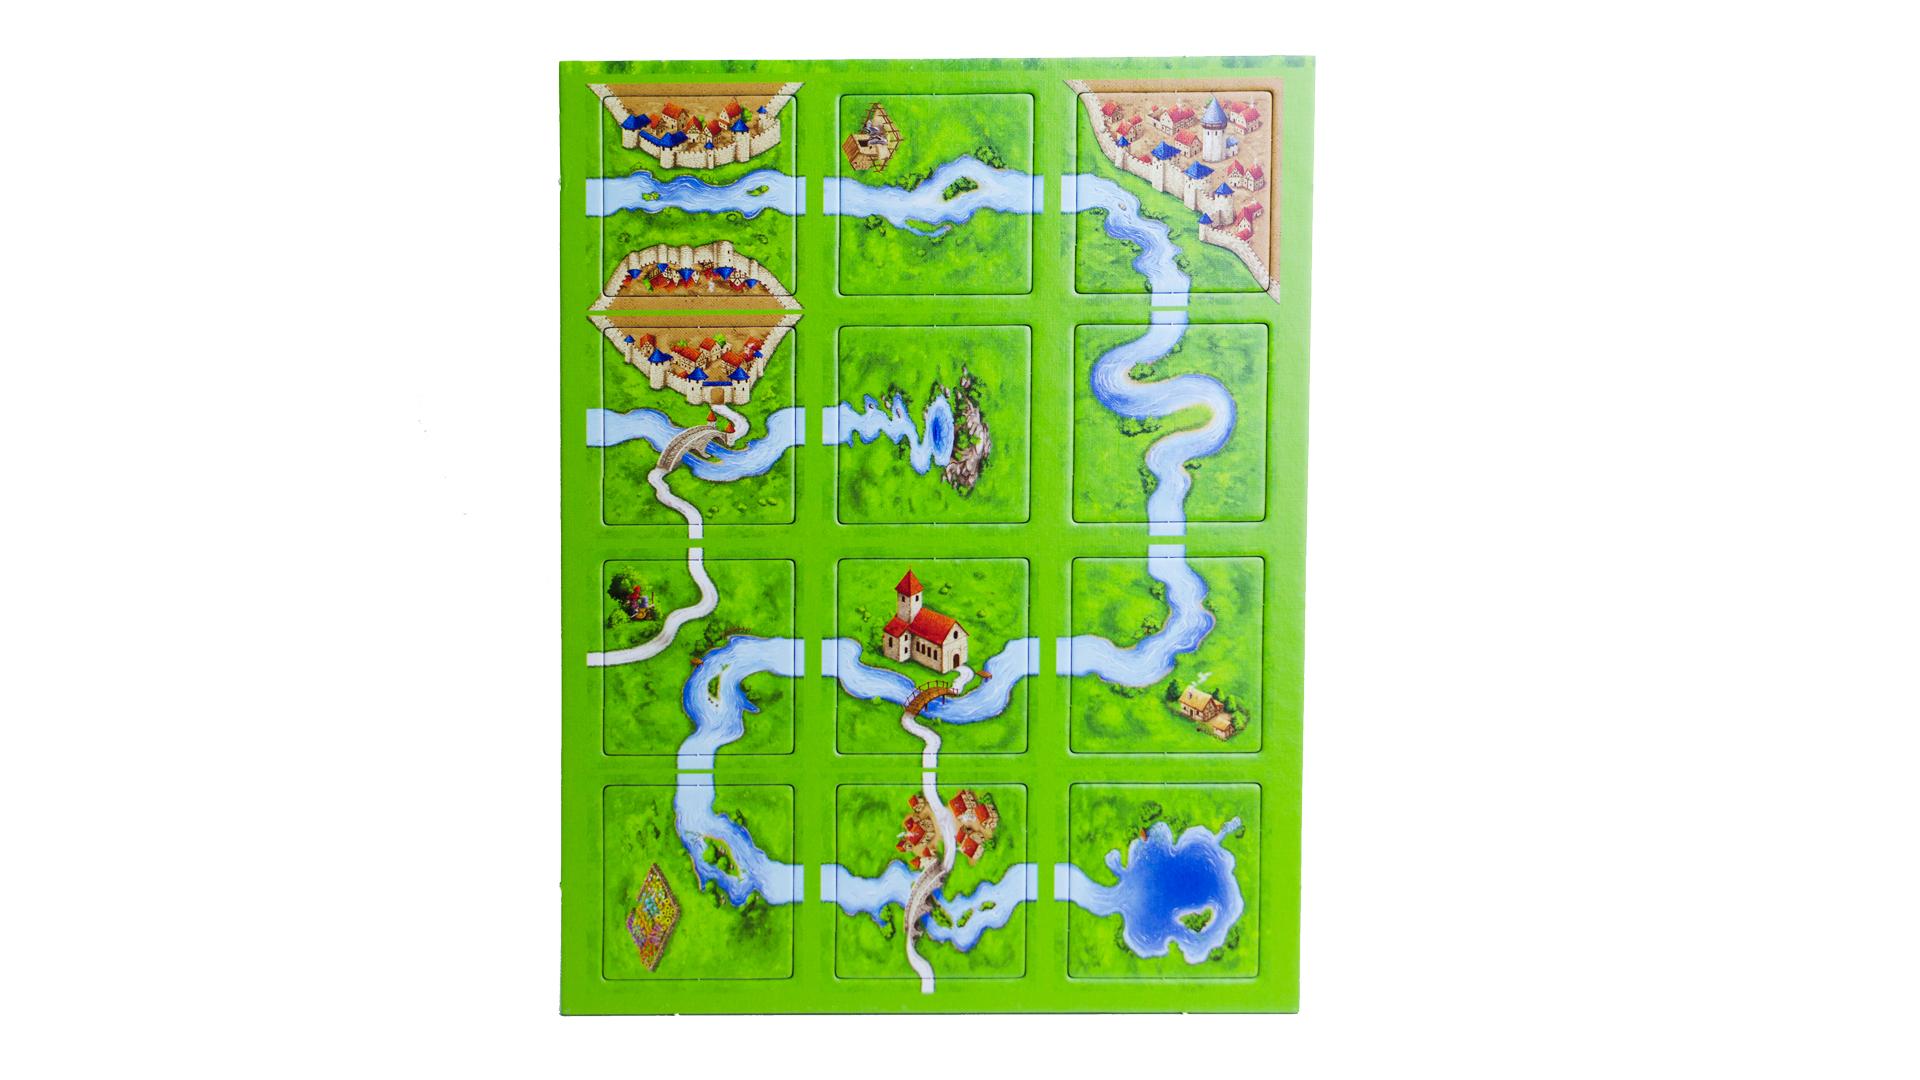 84 card tiles